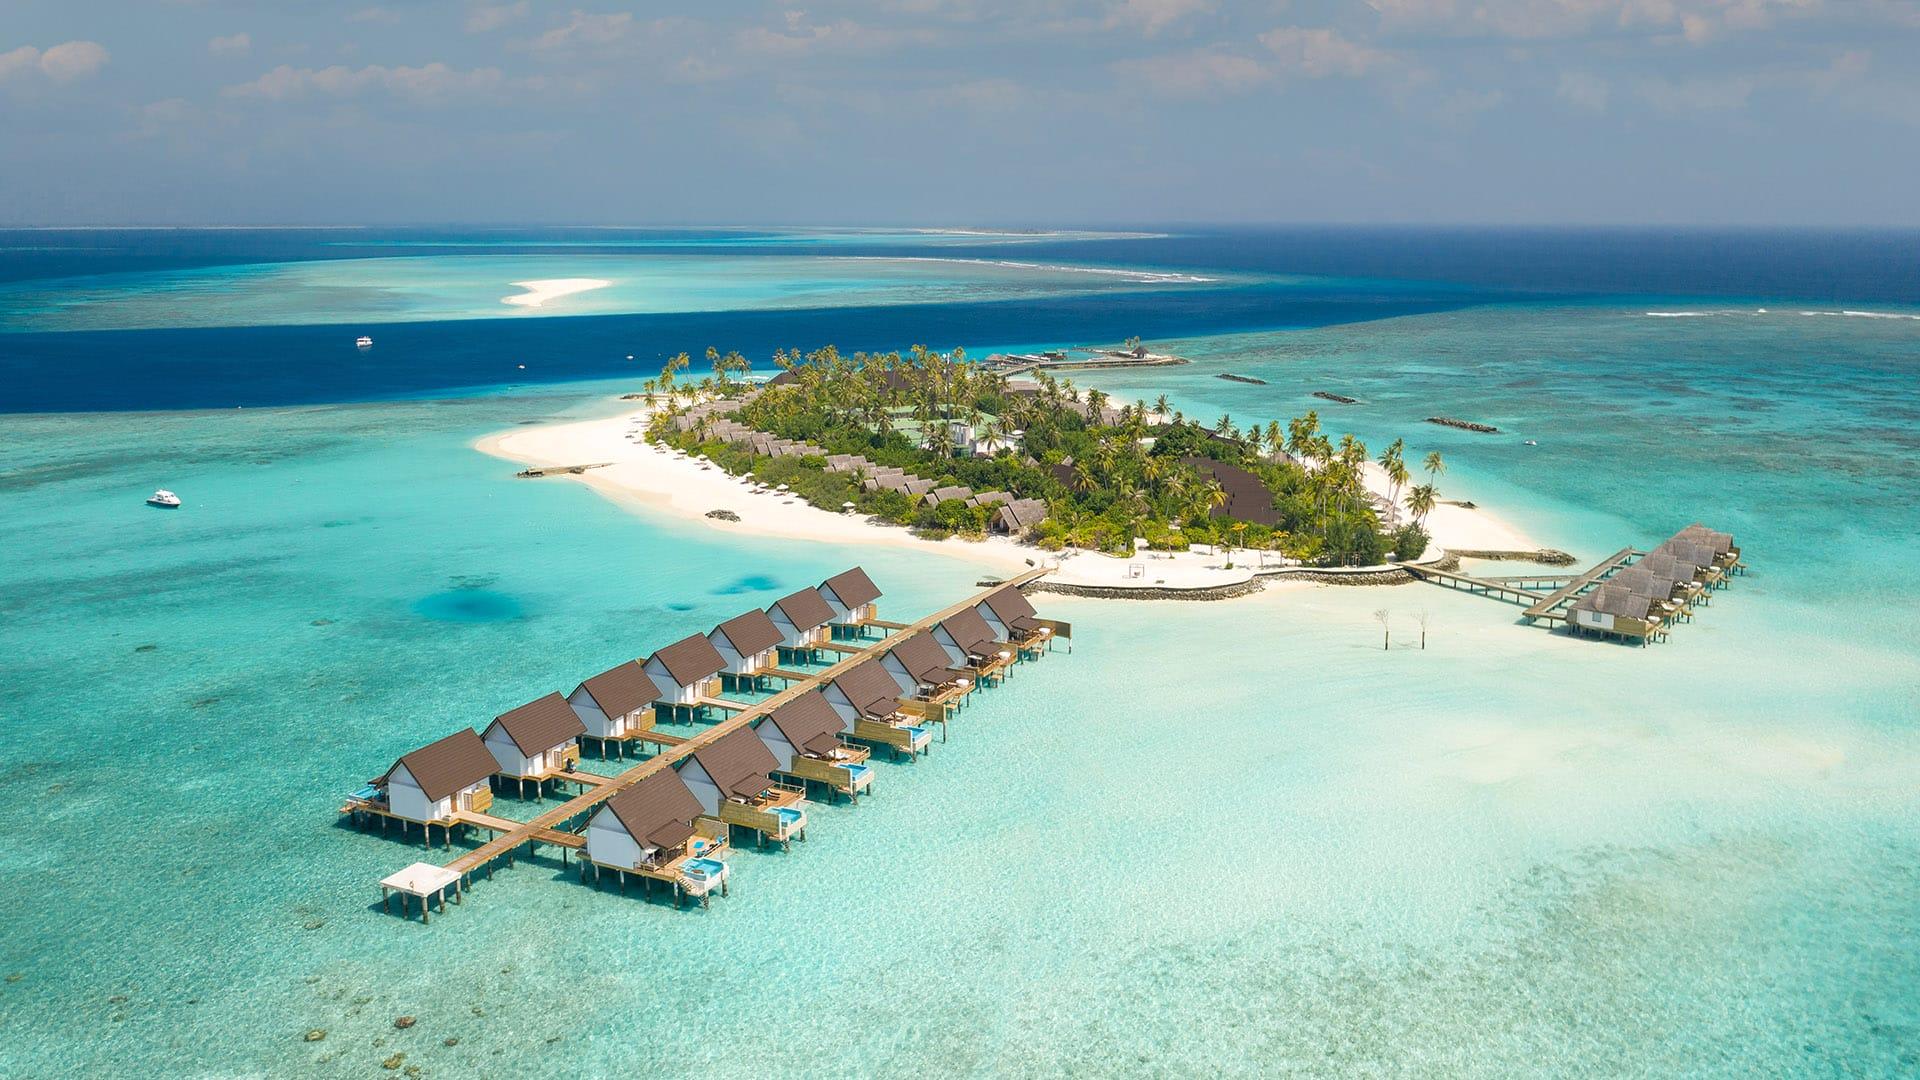 A bird's-eye view of Fushifaru Maldives Resort